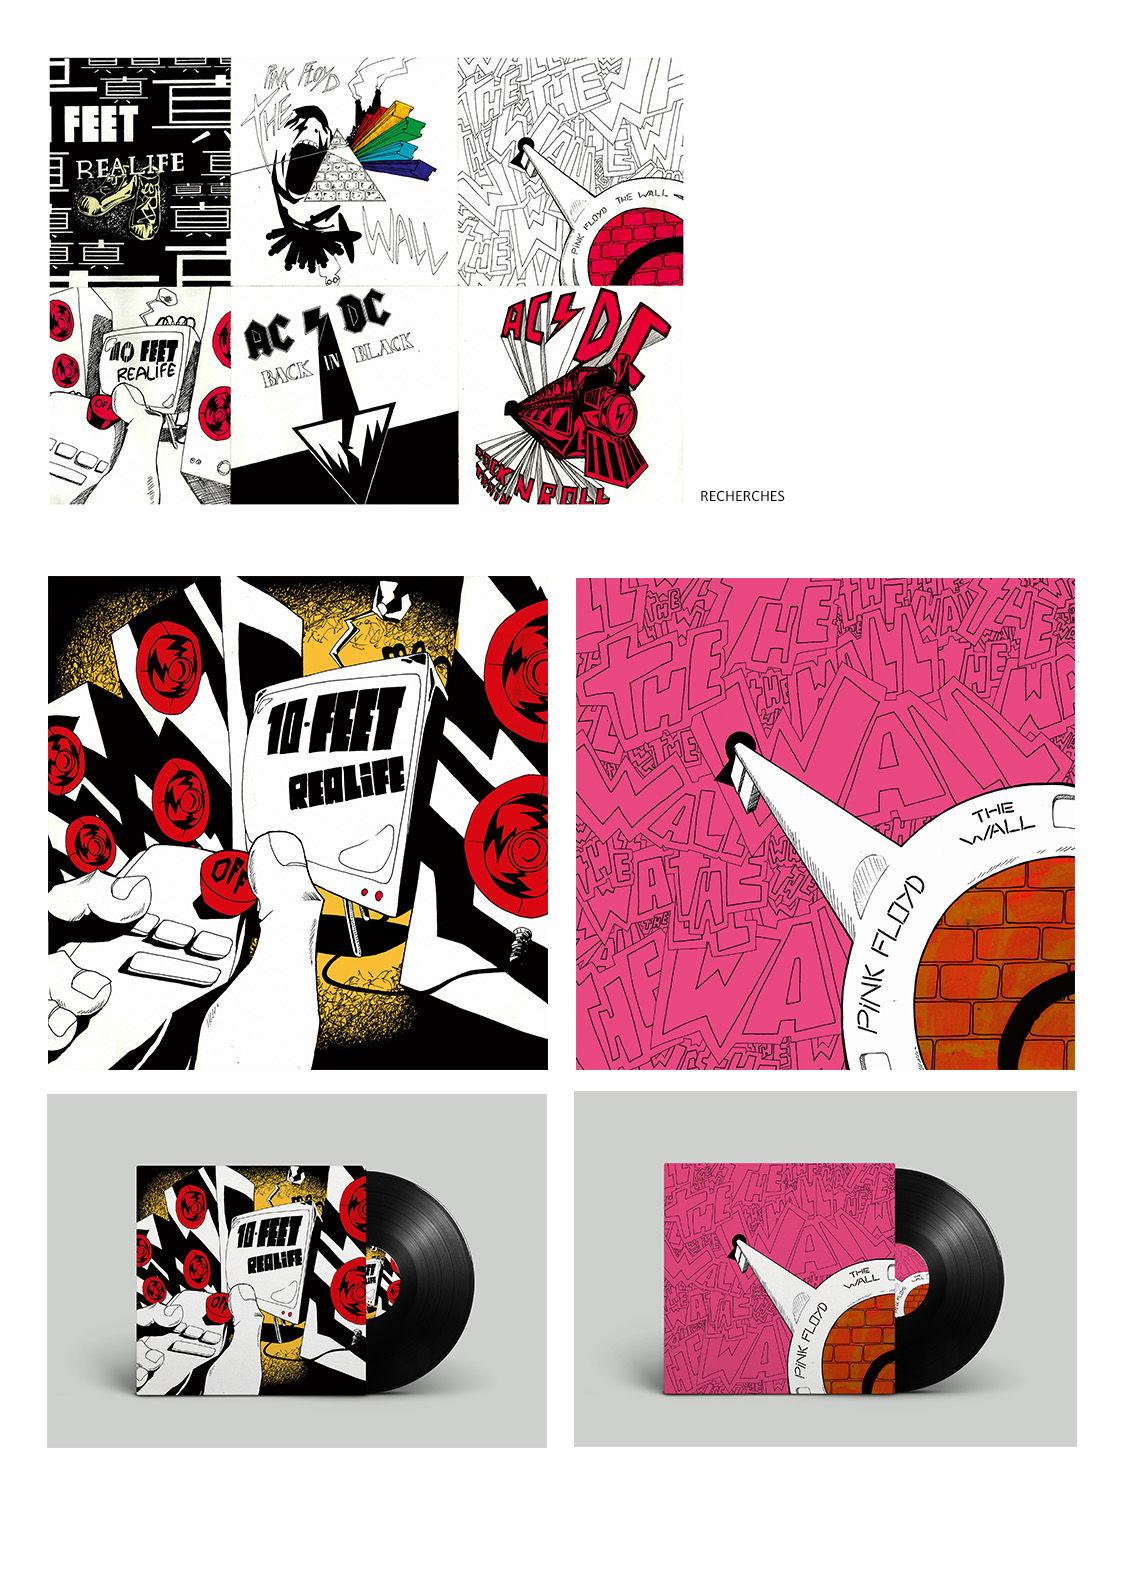 Graphisme pochette vinyle